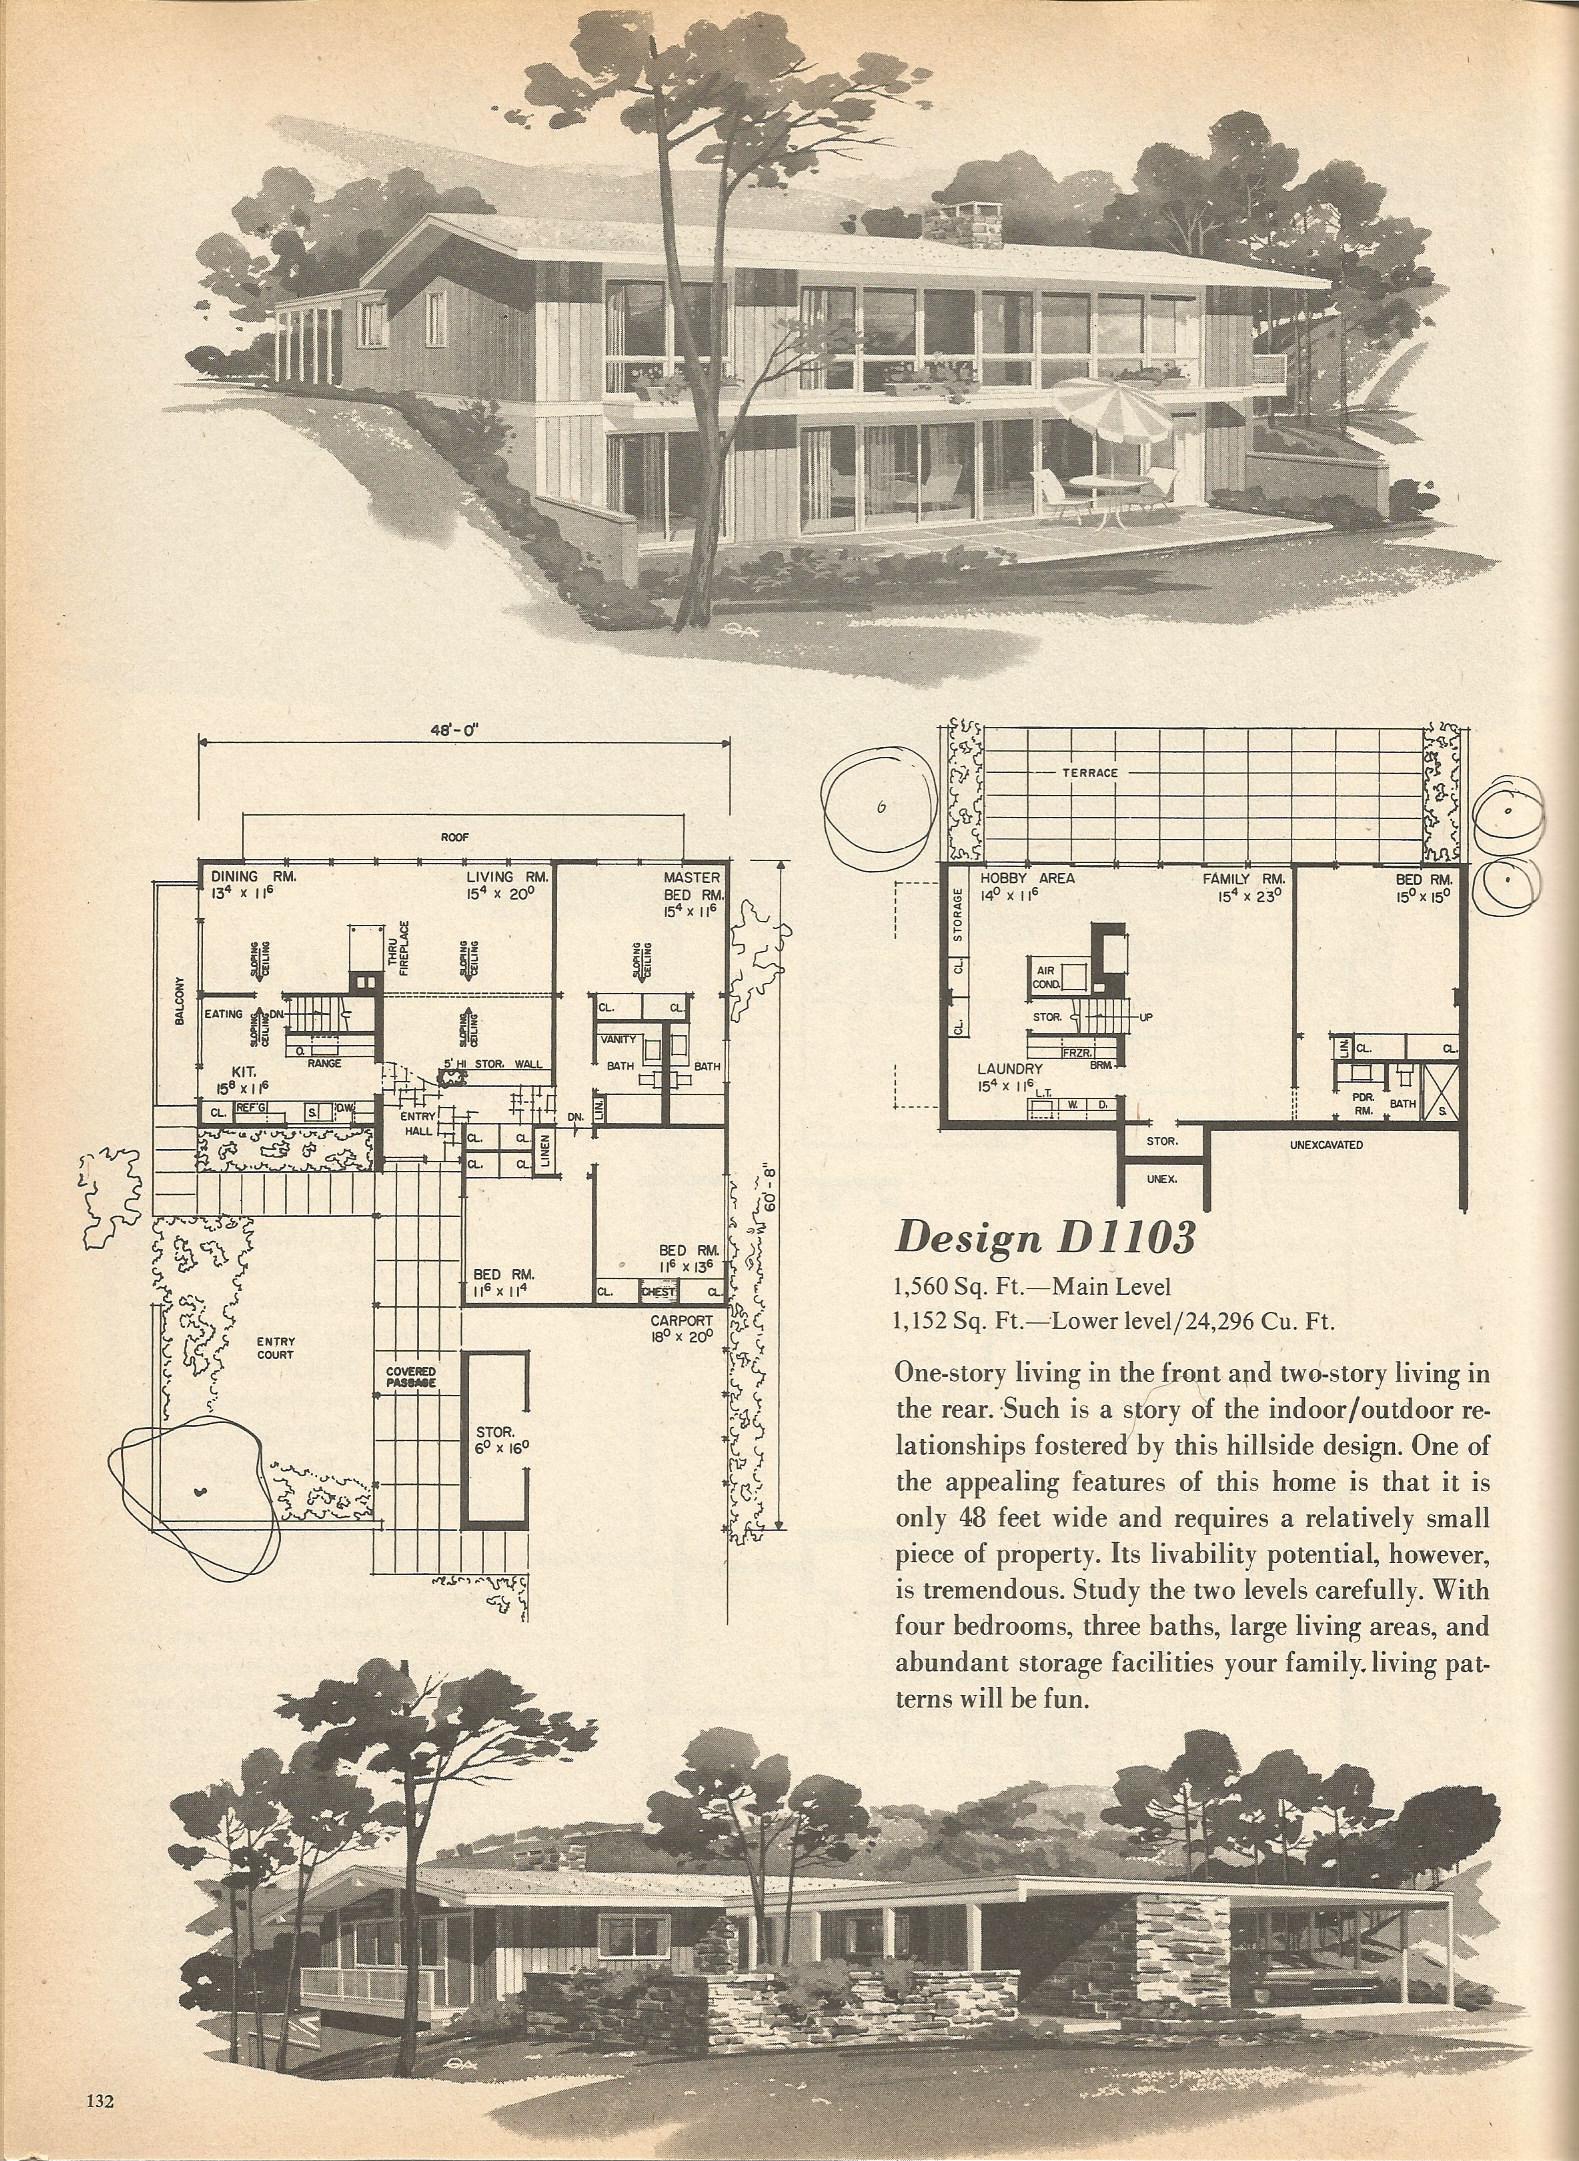 Vintage house plans 1103 antique alter ego for Split level house plans 1960s